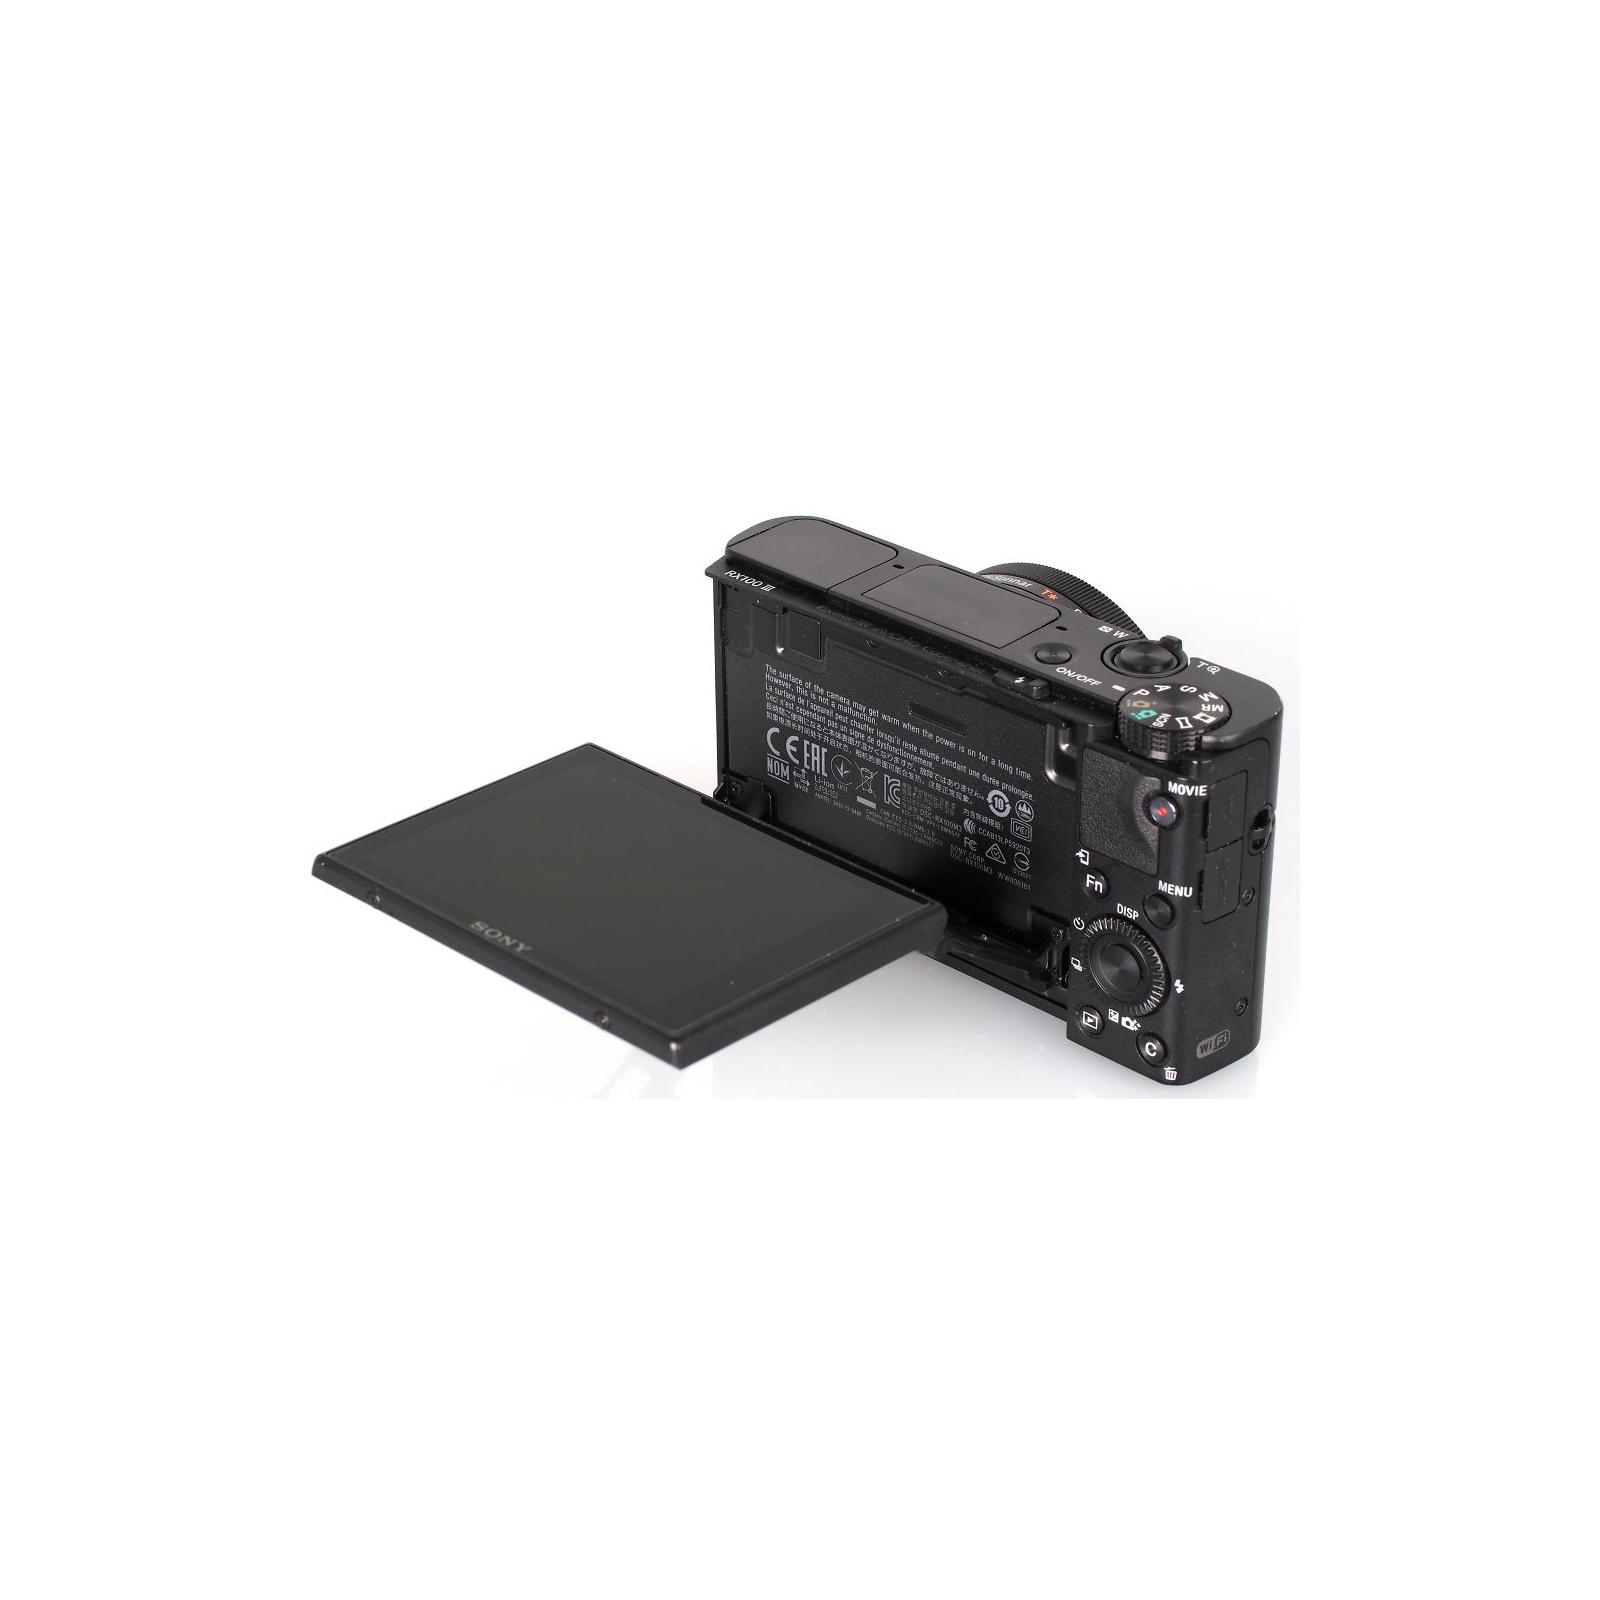 Цифровий фотоапарат SONY Cyber-shot DSC-RX100 Mark III (DSCRX100M3.RU3) зображення 5